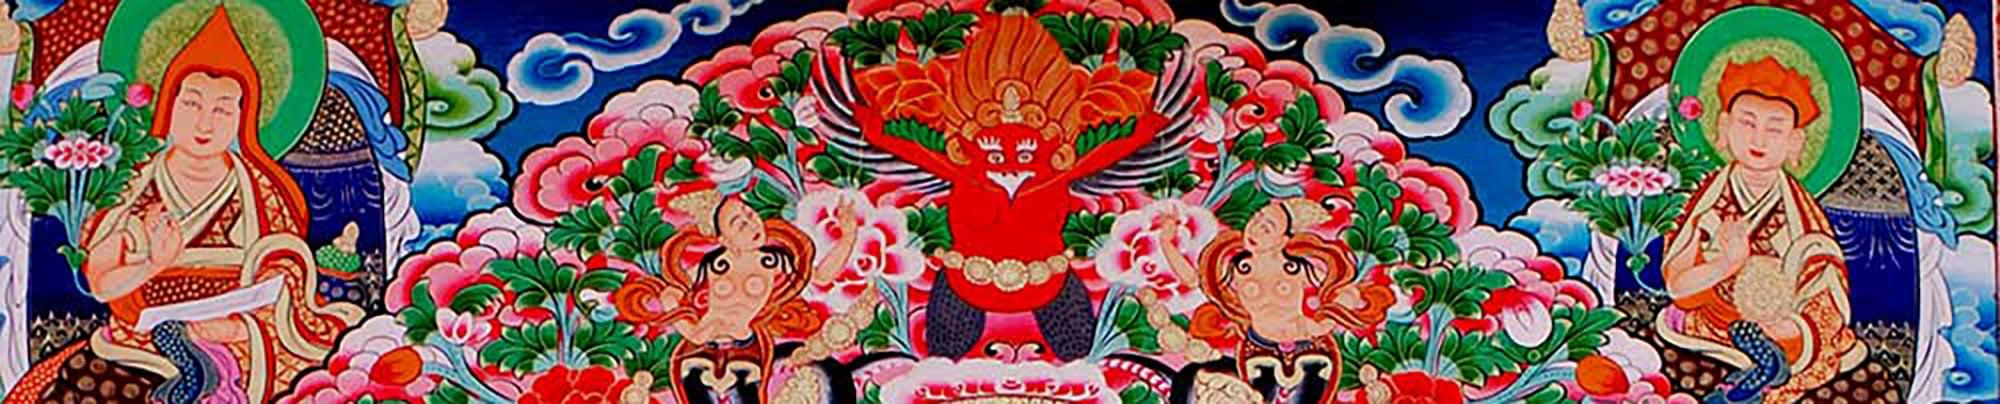 Buddha Weekly background 10081211